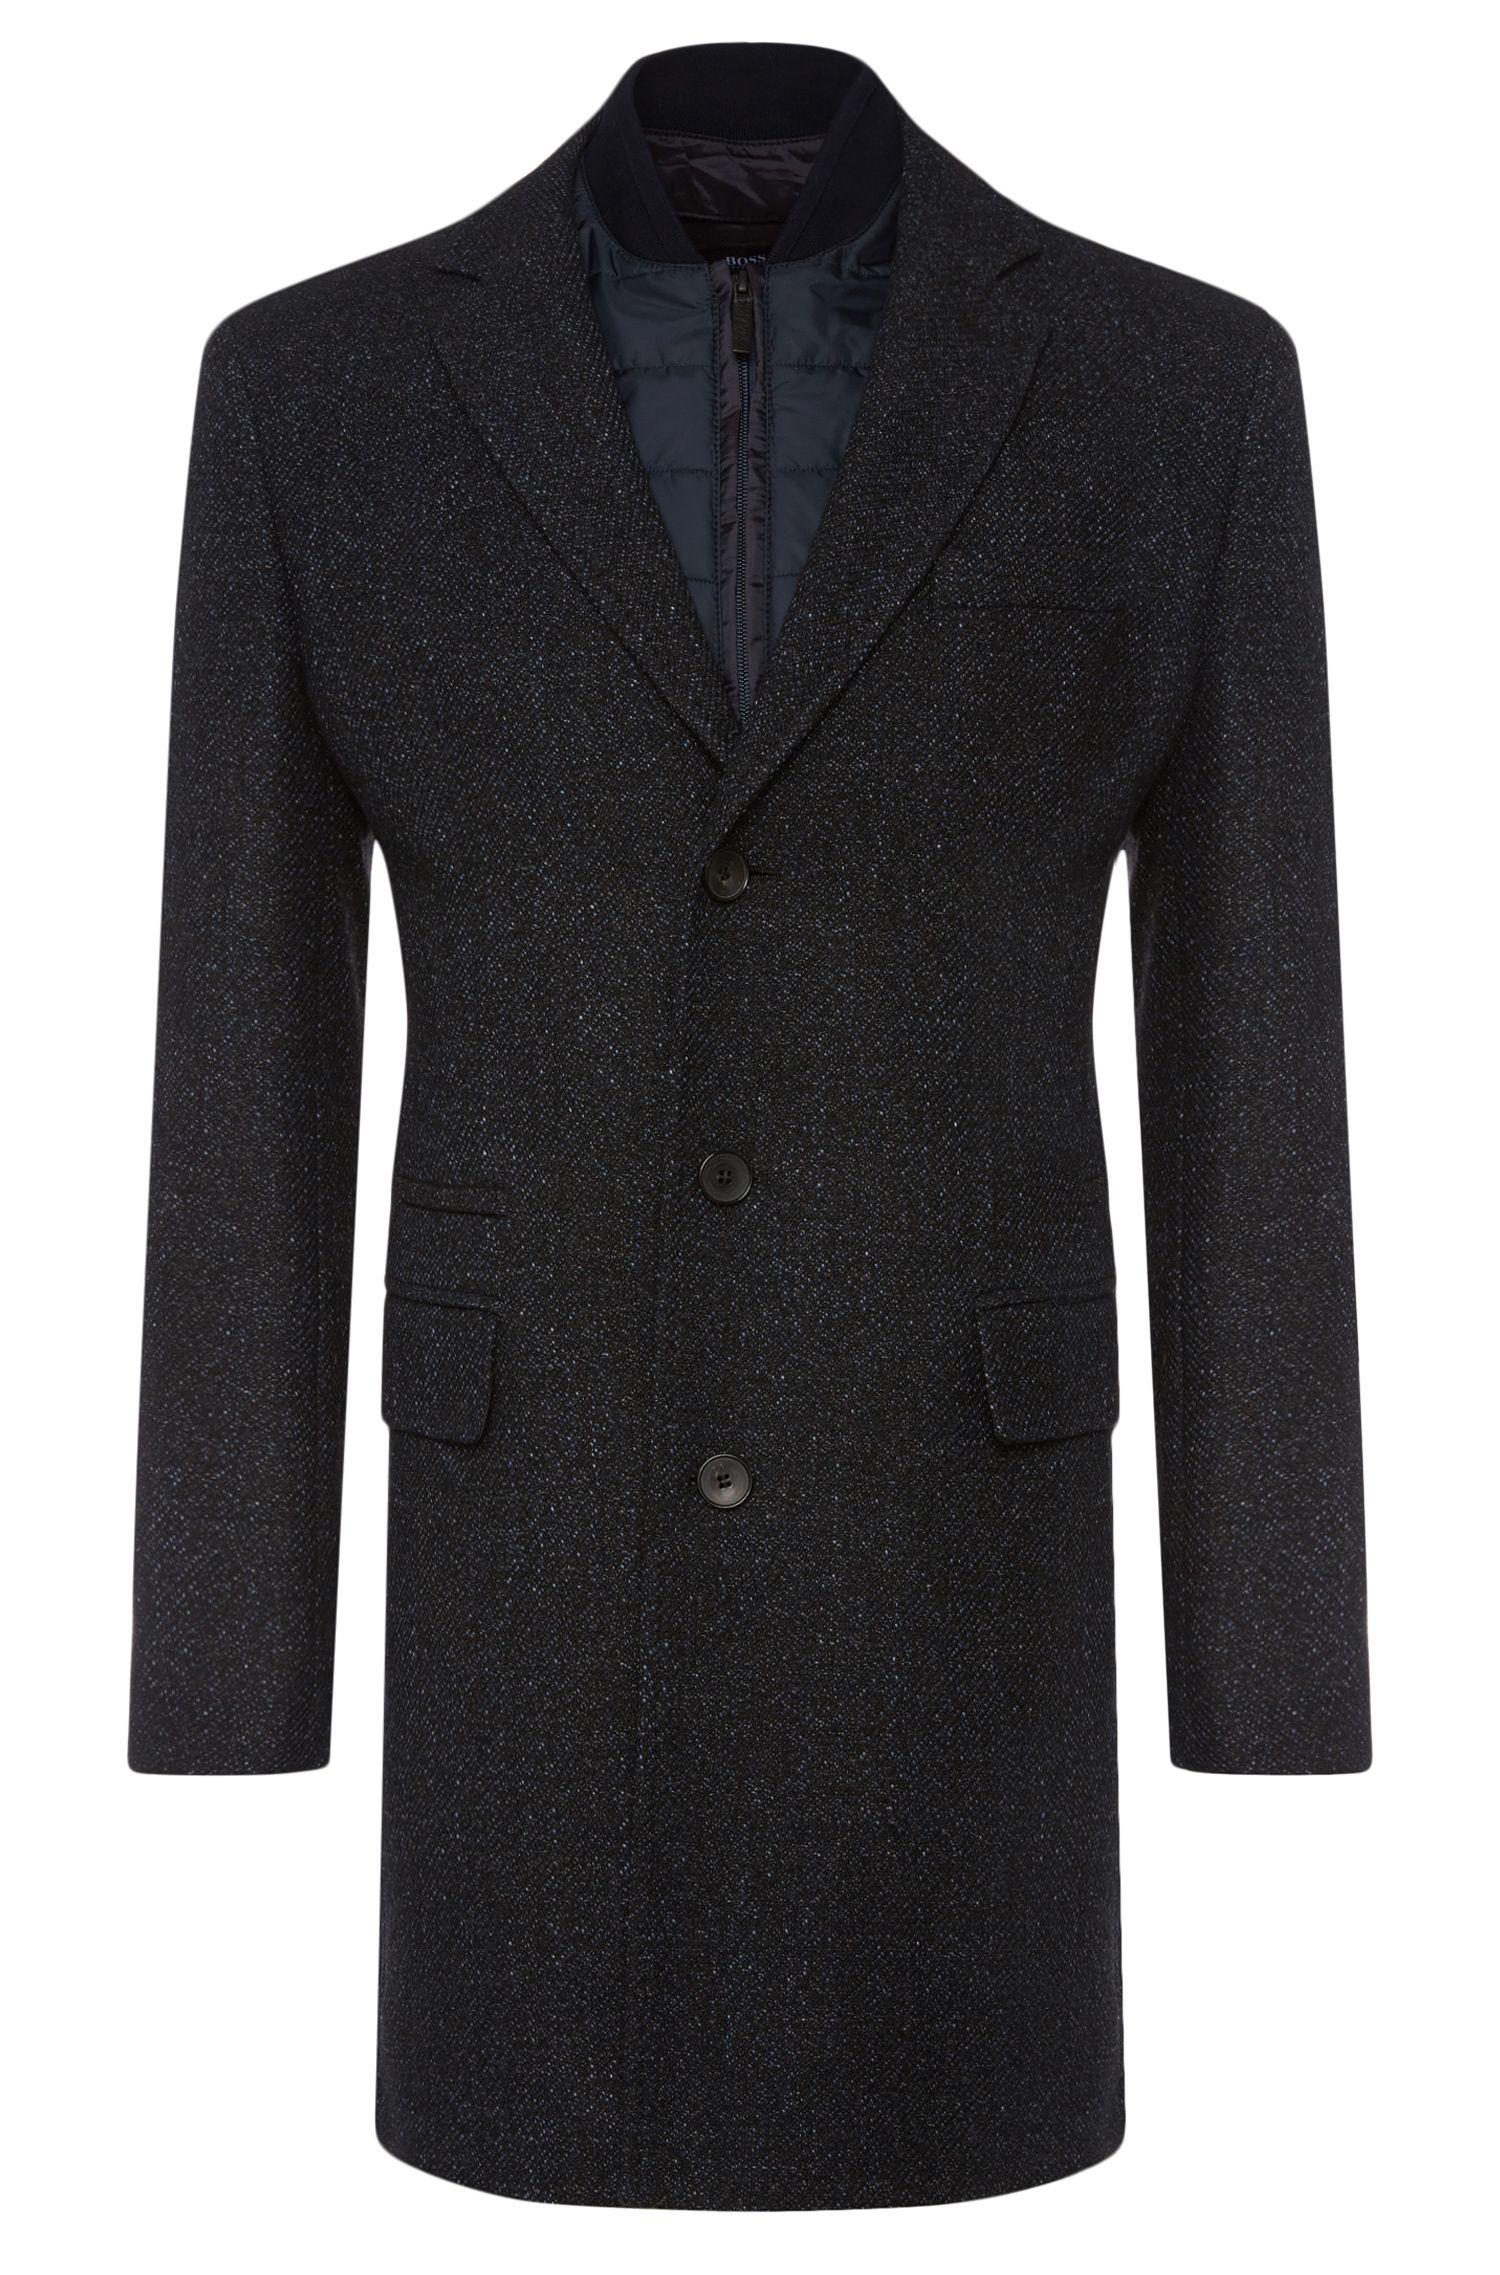 'Nadim' | Virgin Wool Blend Donegal Car Coat, Removable Bib